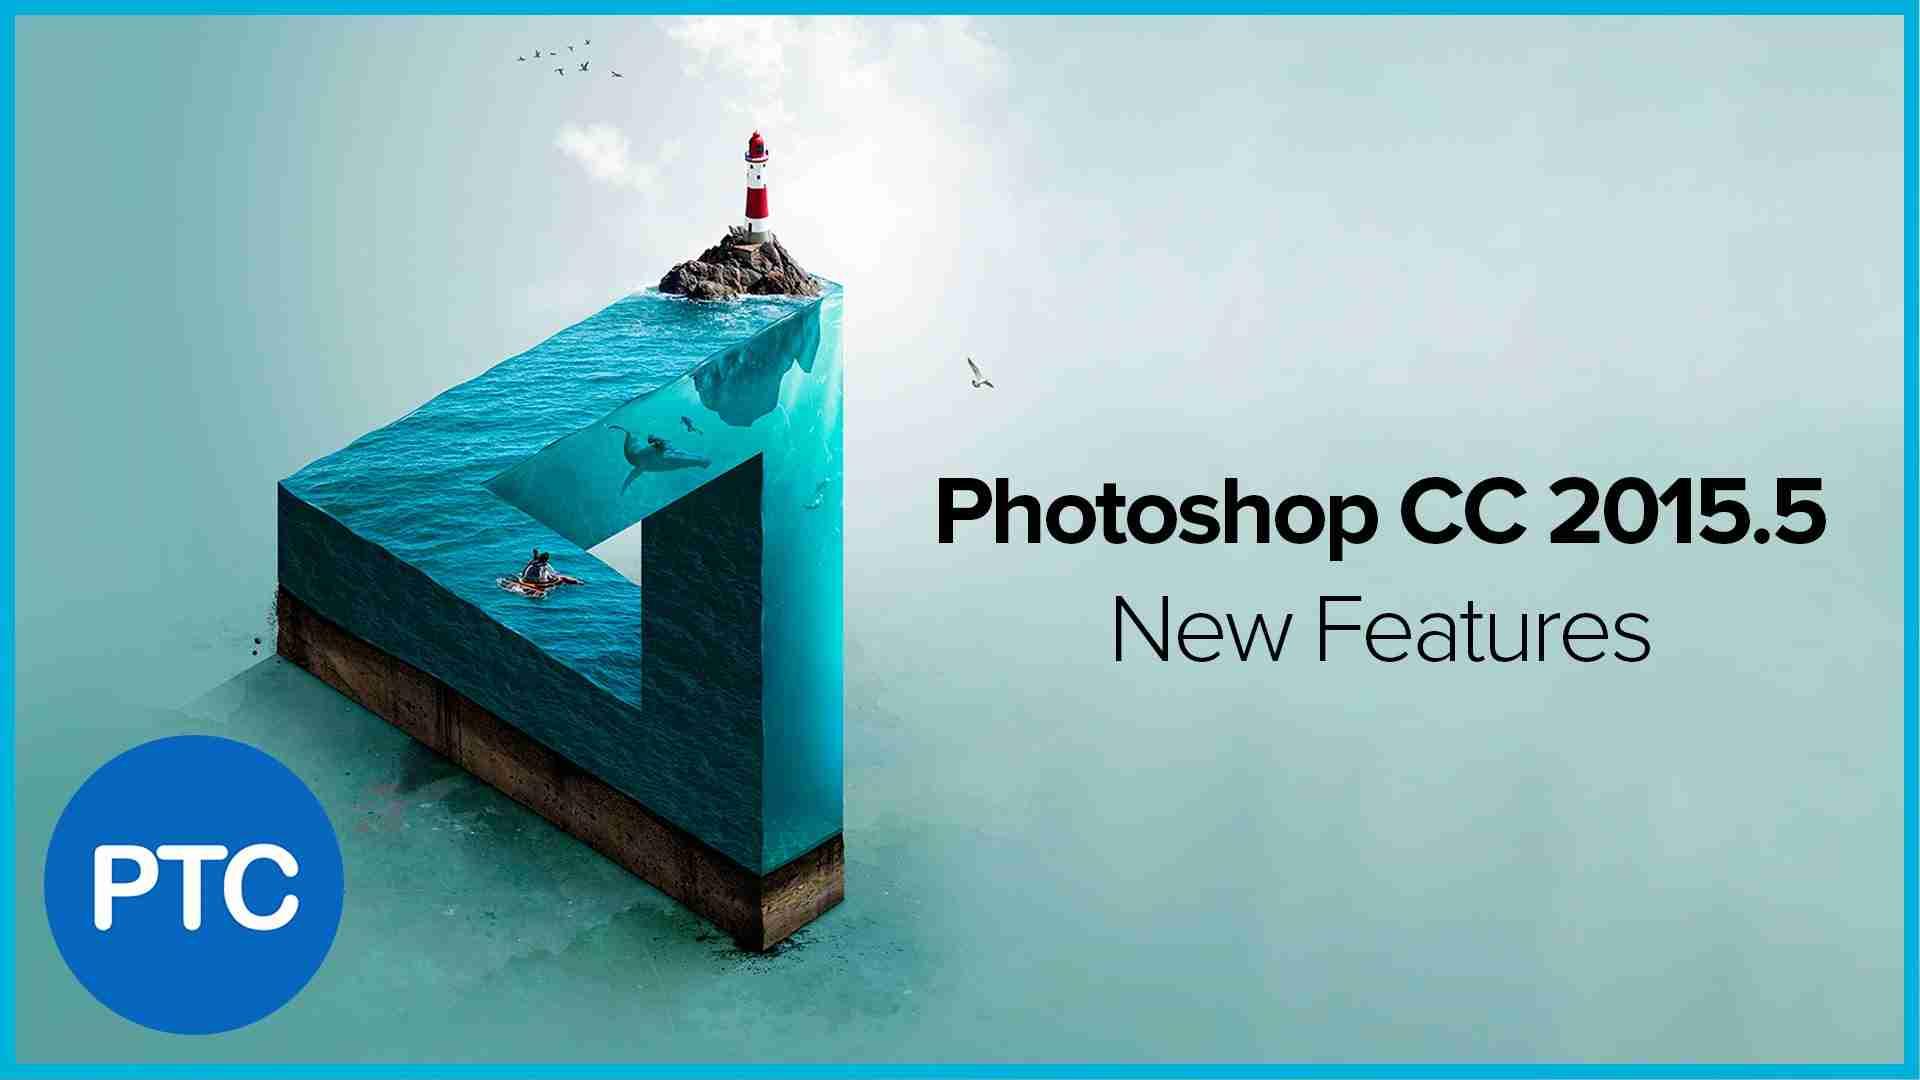 Adobe photoshop cc 2018 19. 1. 5 (32-bit) download for windows.